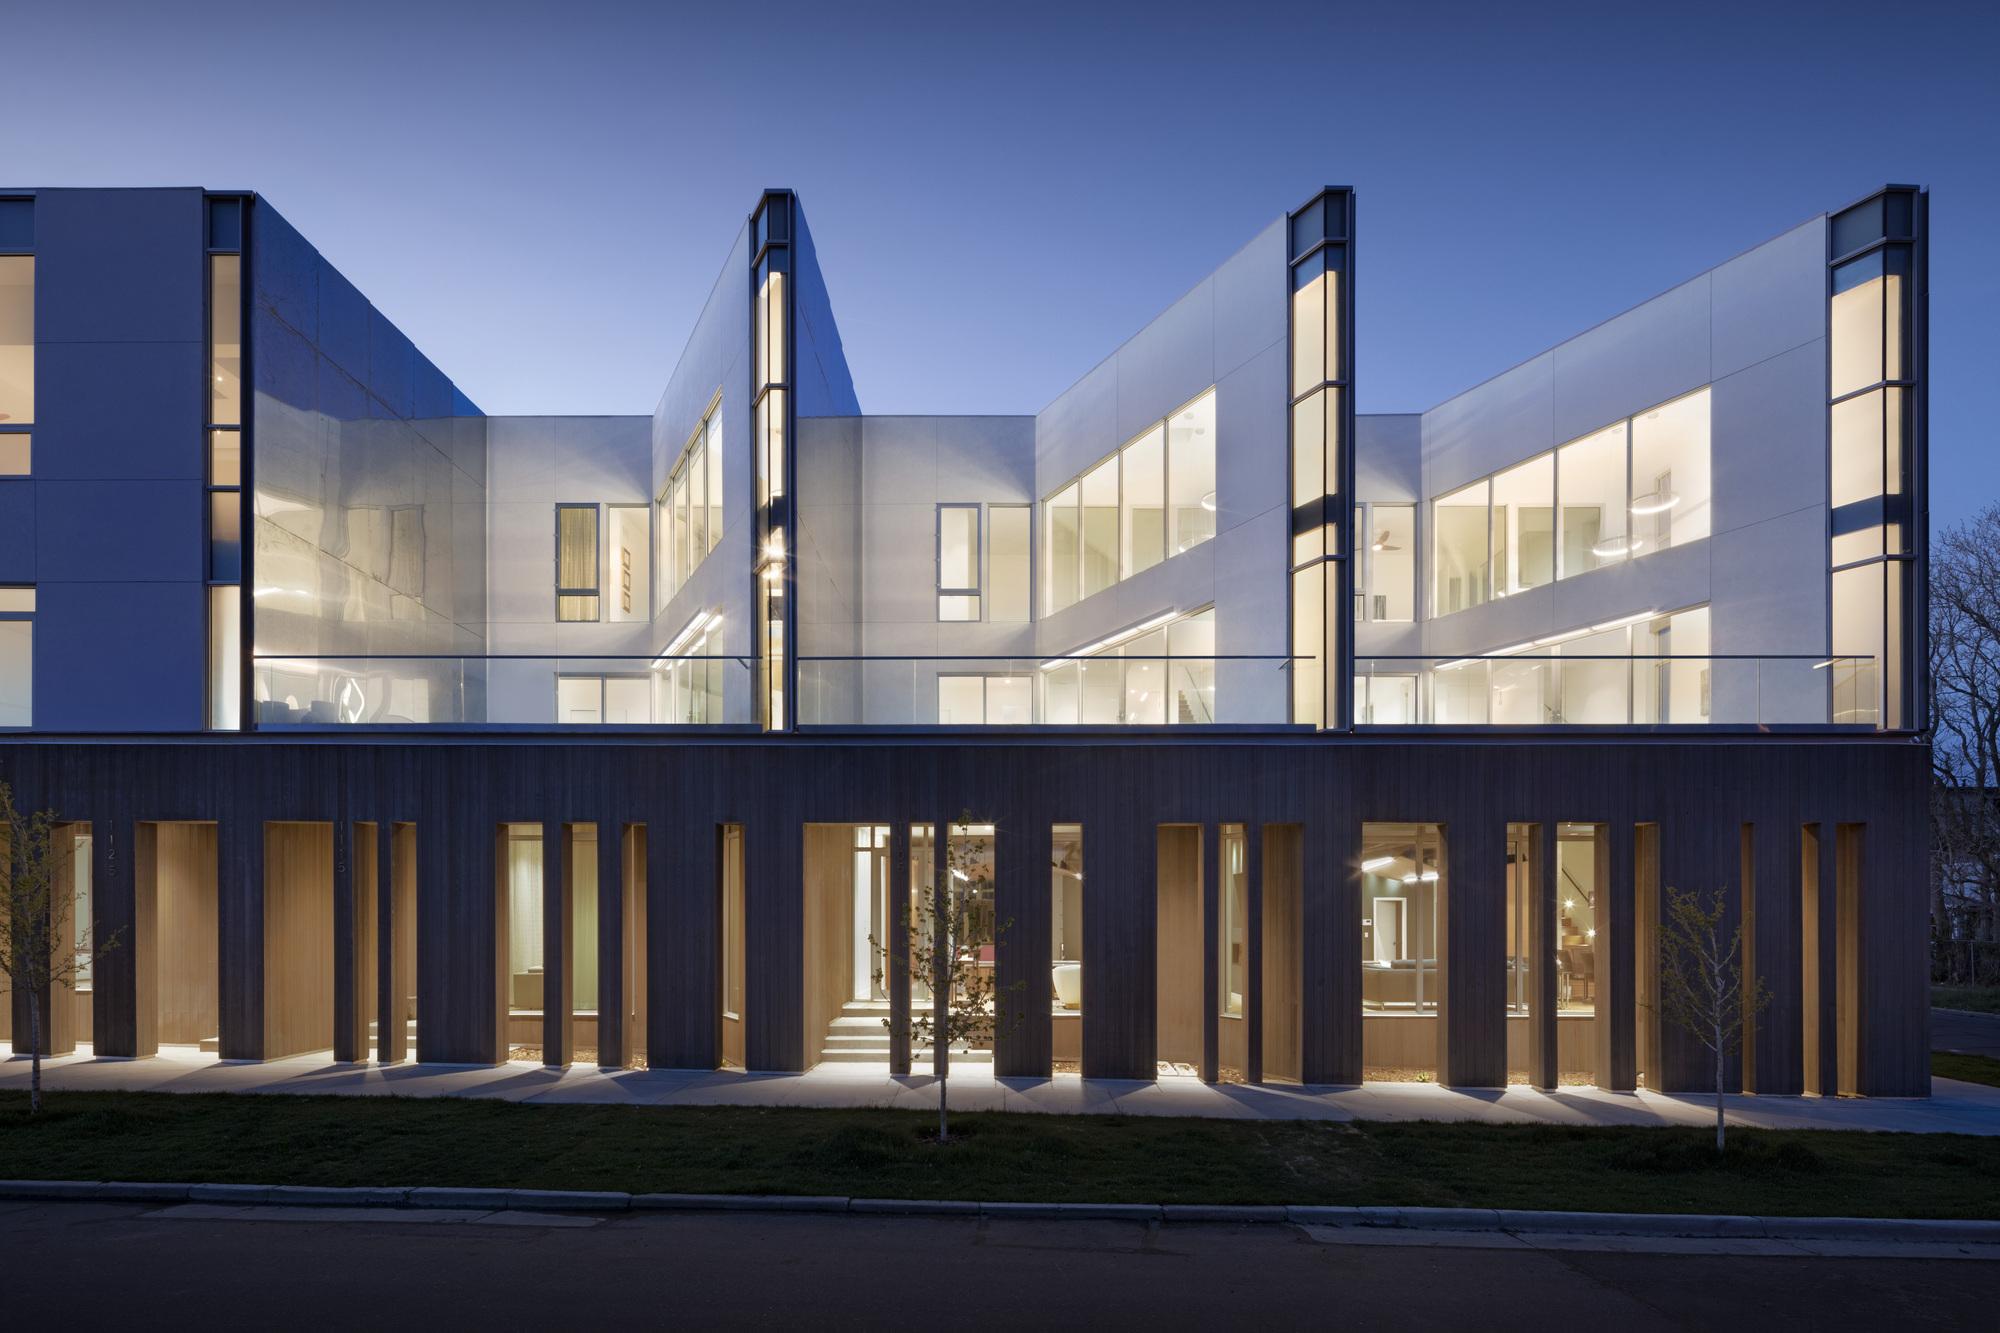 Jason Street Multifamily / Meridian 105 Architecture